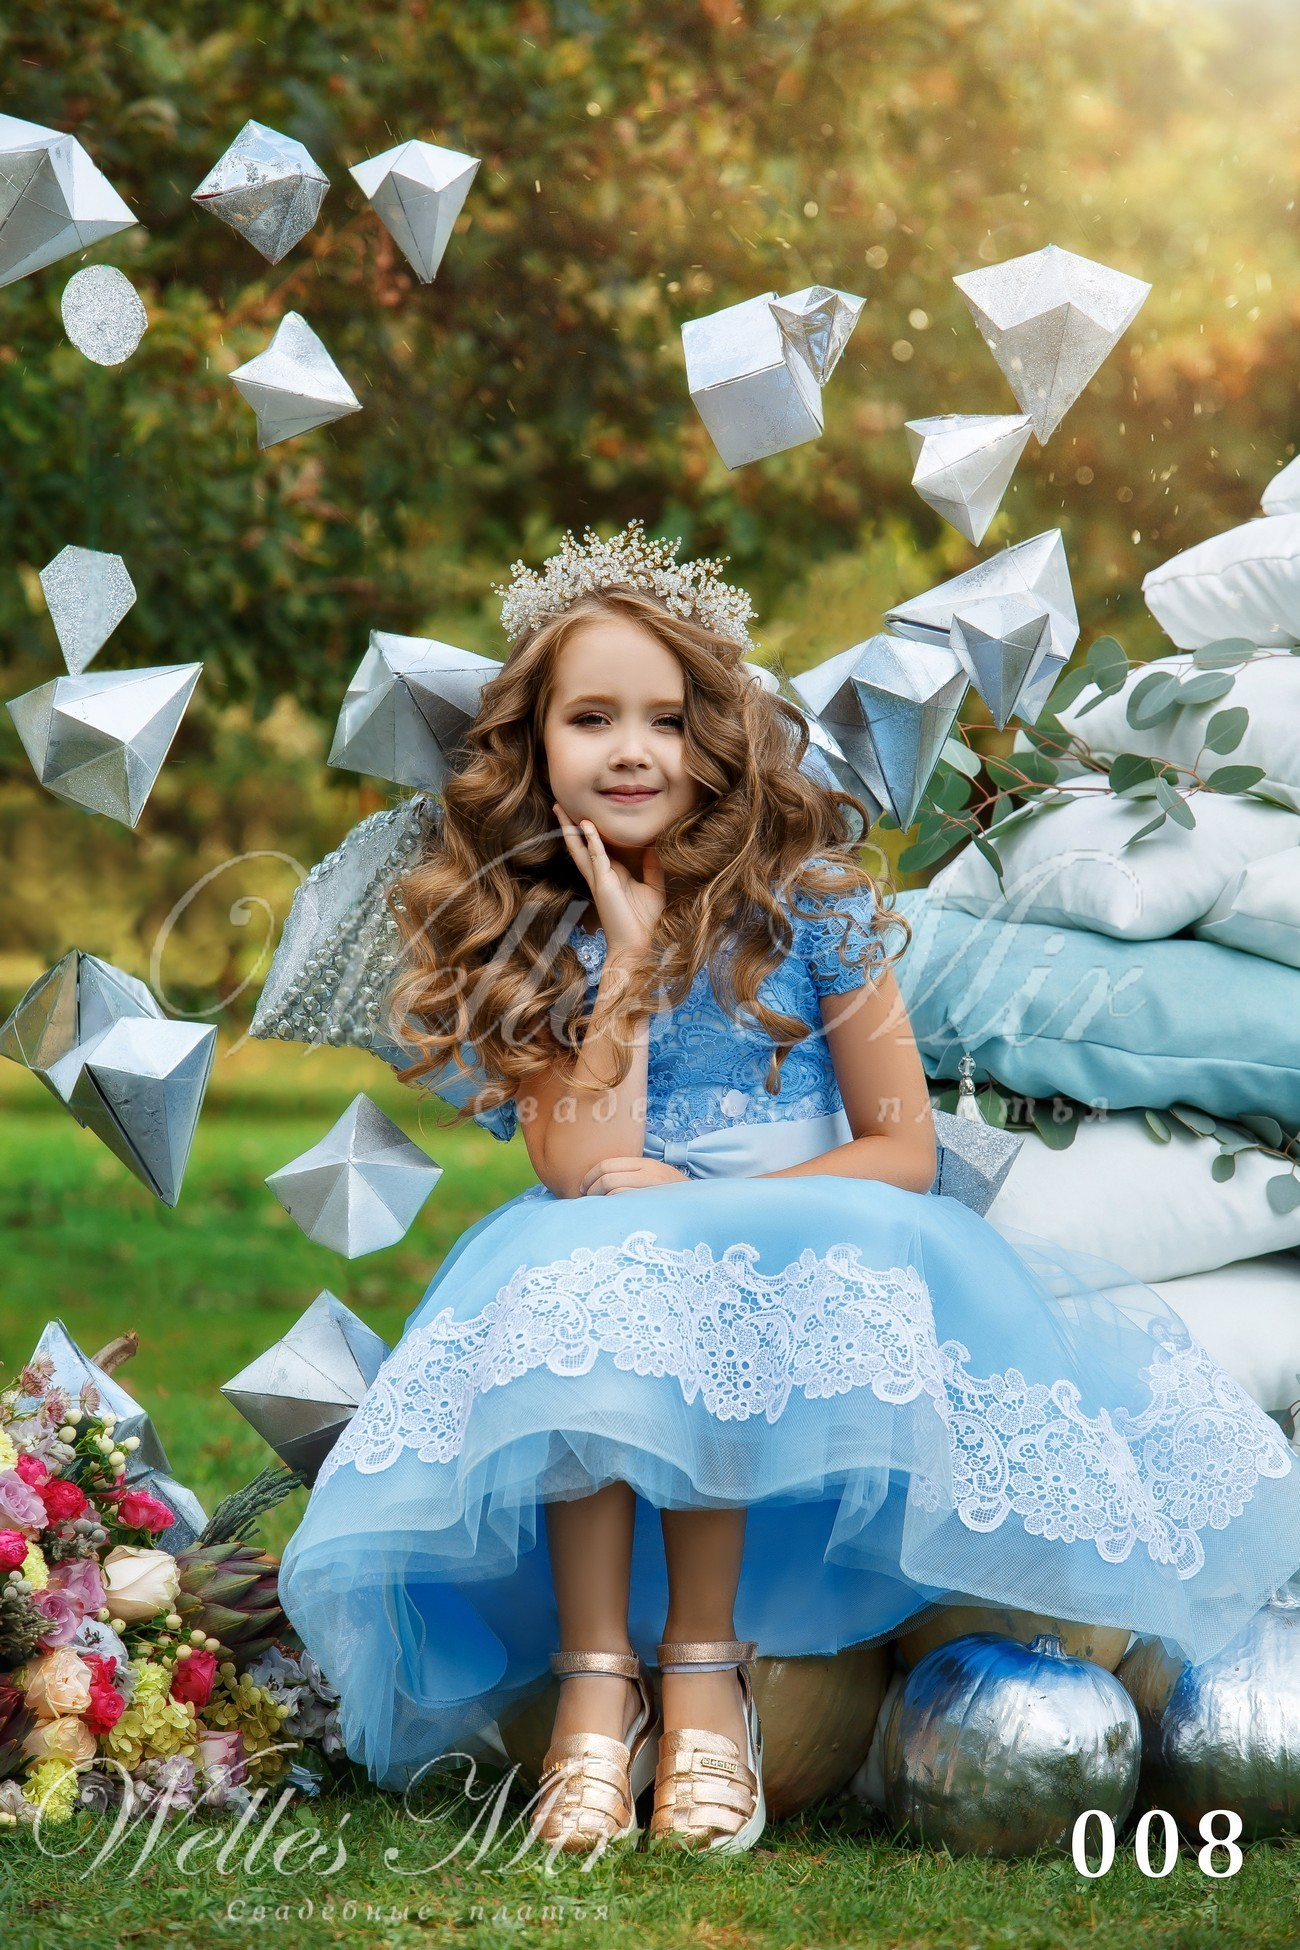 Детские платья Kids Deluxe Collection 2018 - 008